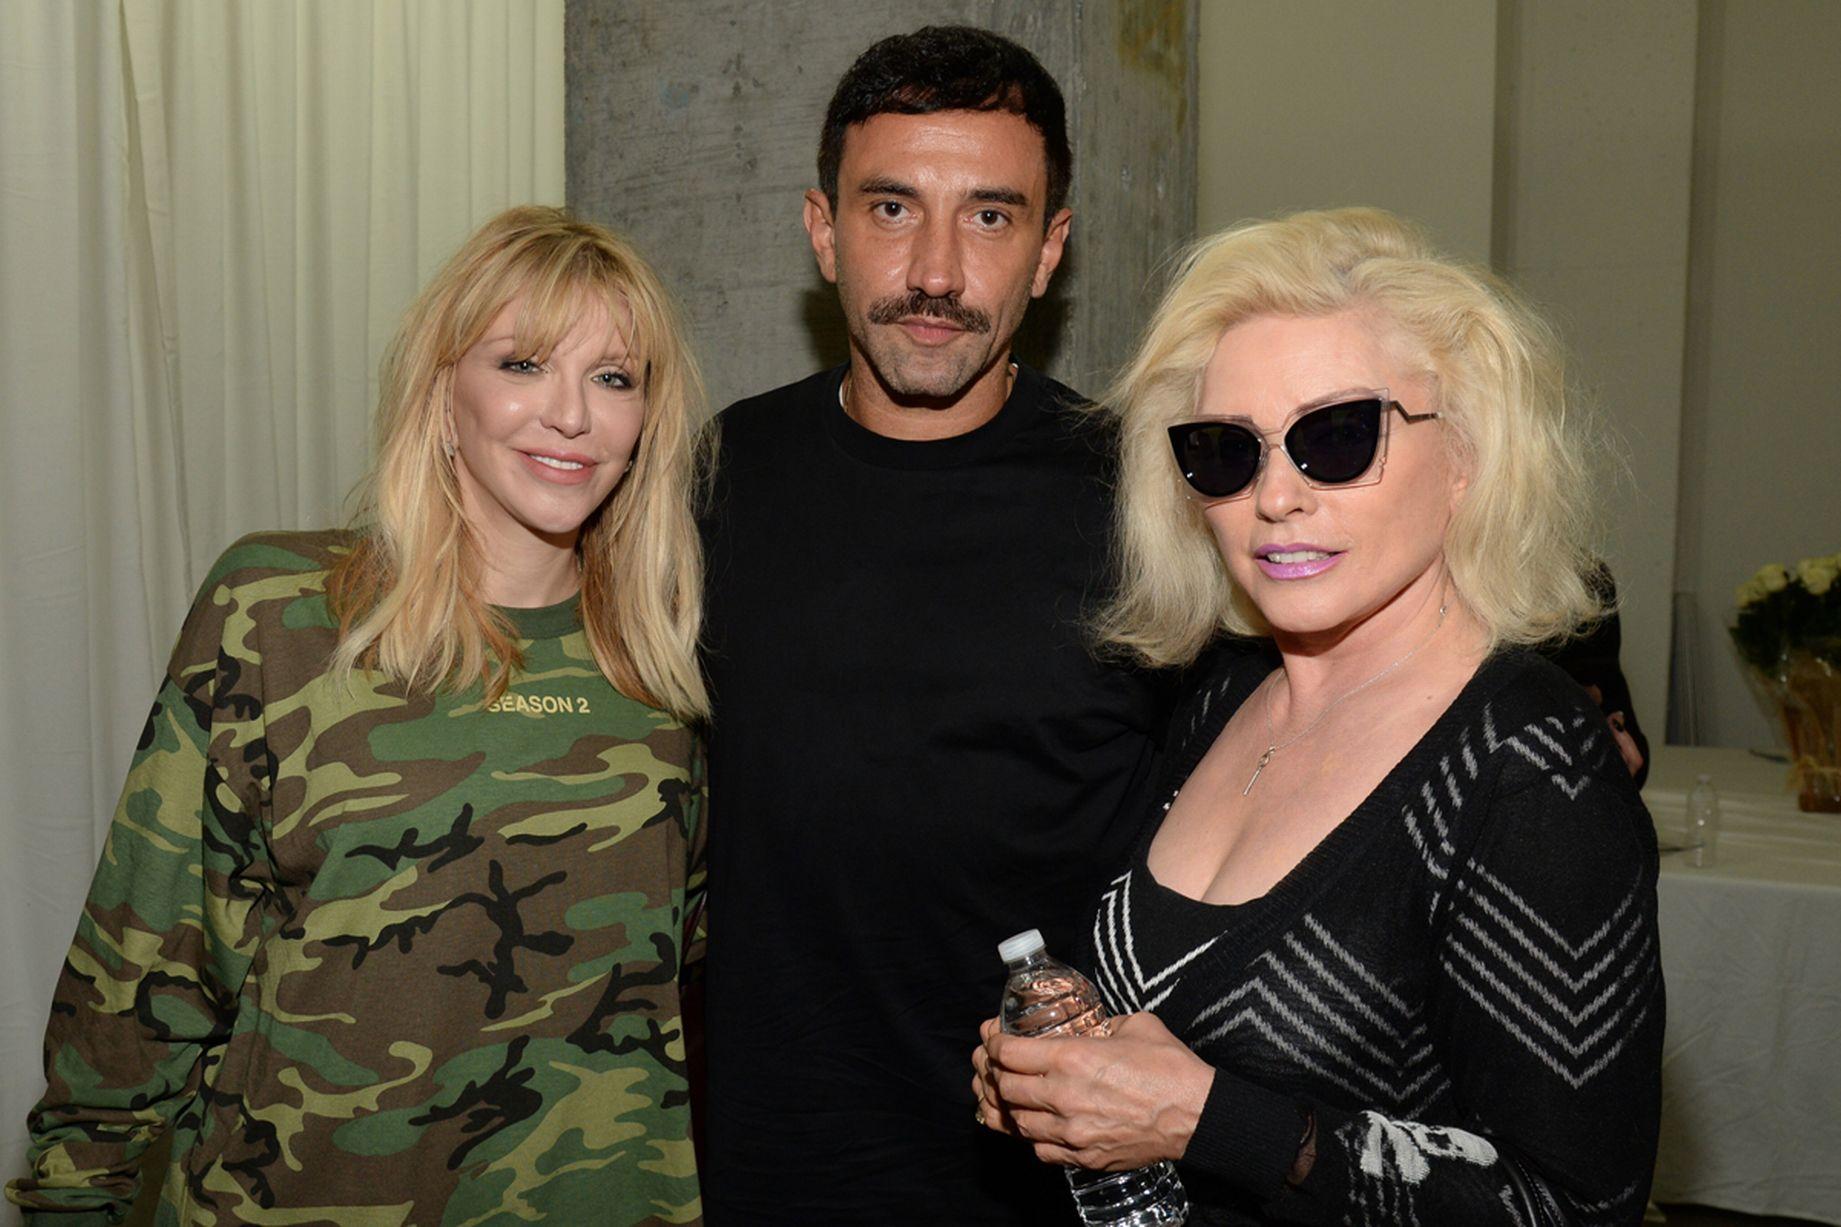 Courtney-Love-Riccardo-Tisci-and-Debbie-Harry-attend-Kanye-West-Yeezy-Season-2.jpg